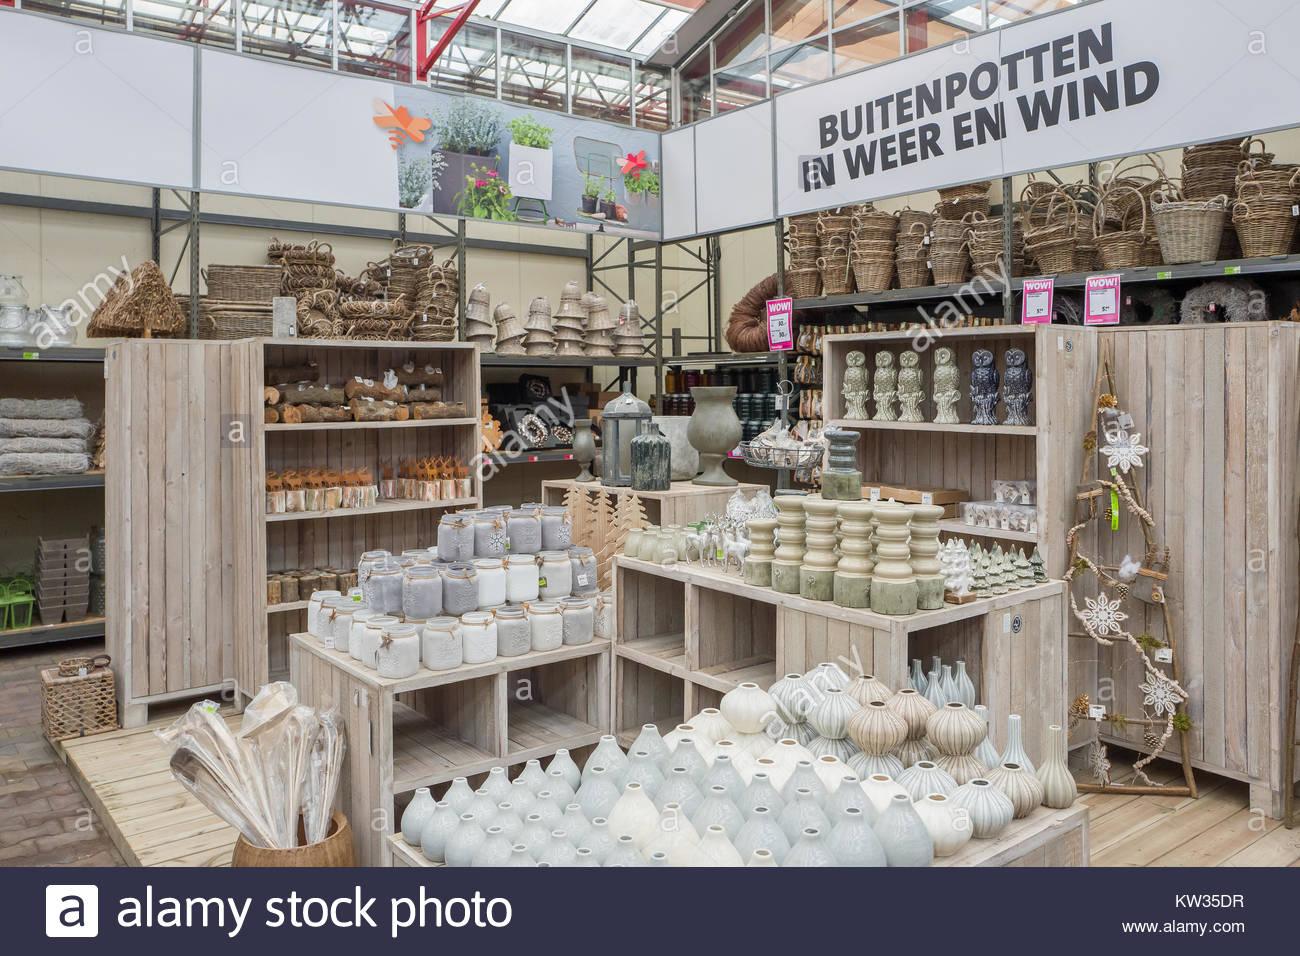 Knick knacks nobody stock photos knick knacks nobody for Home design zoetermeer